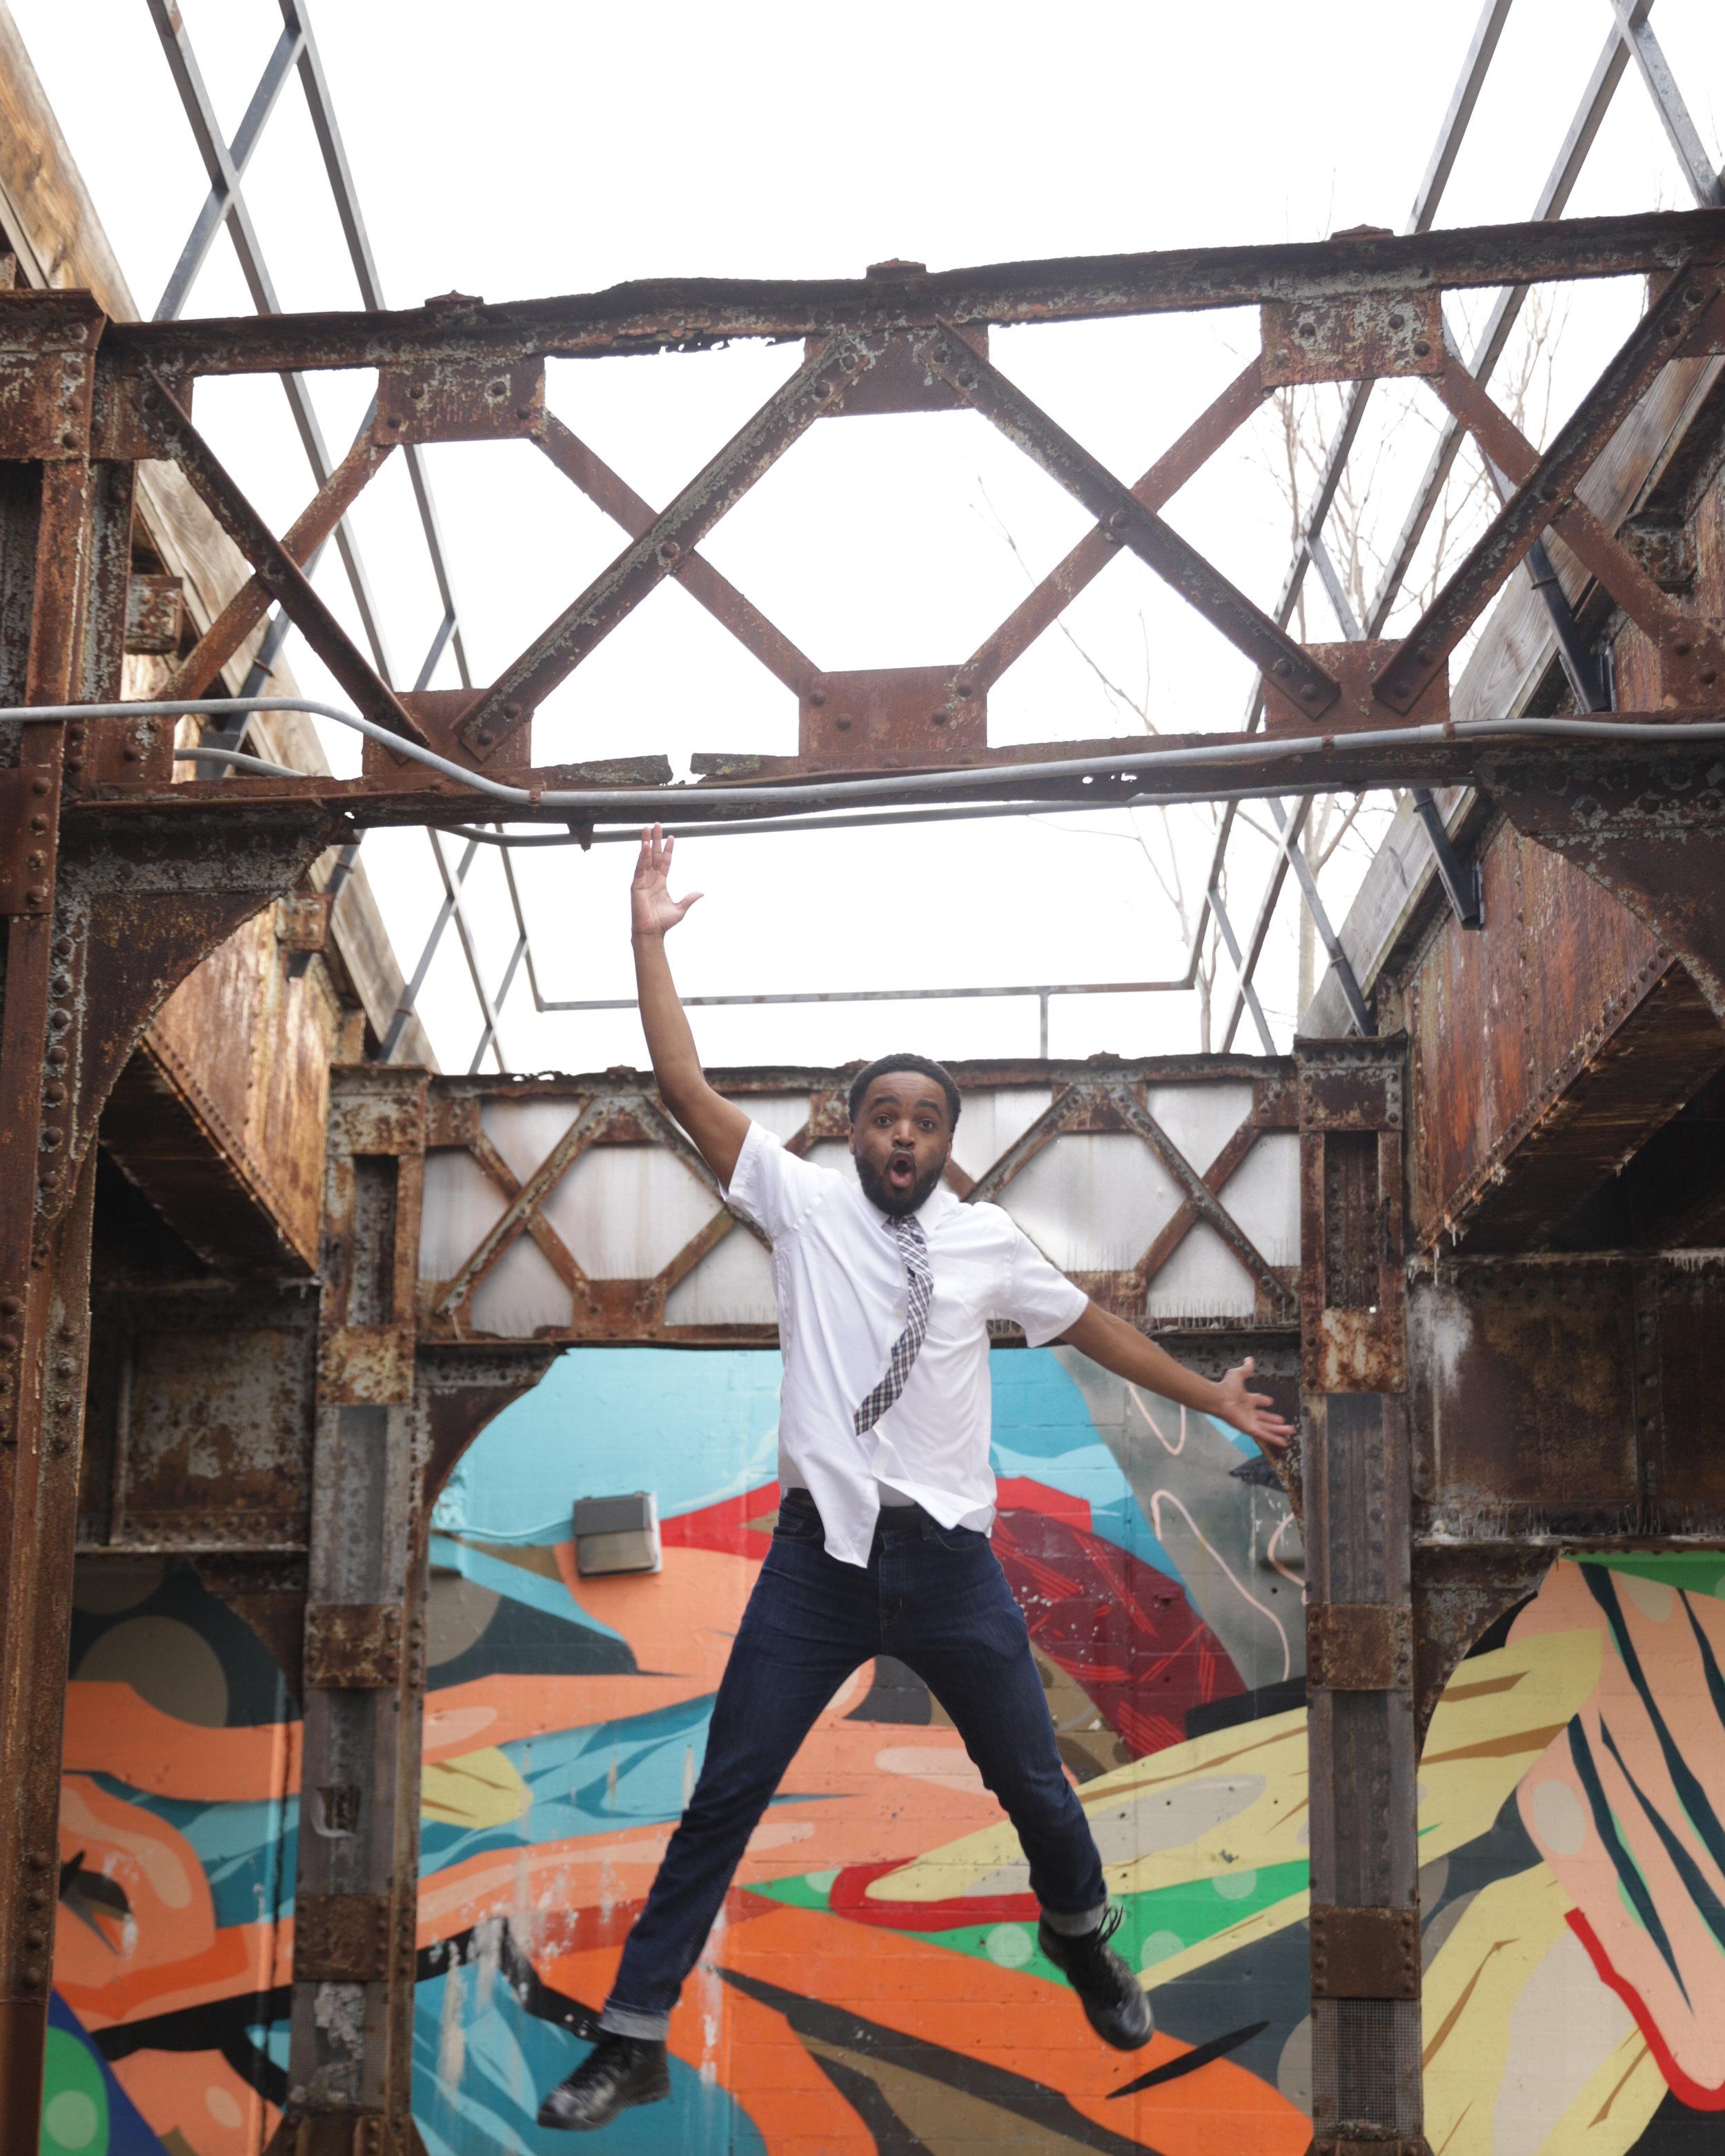 jumping mural.jpg